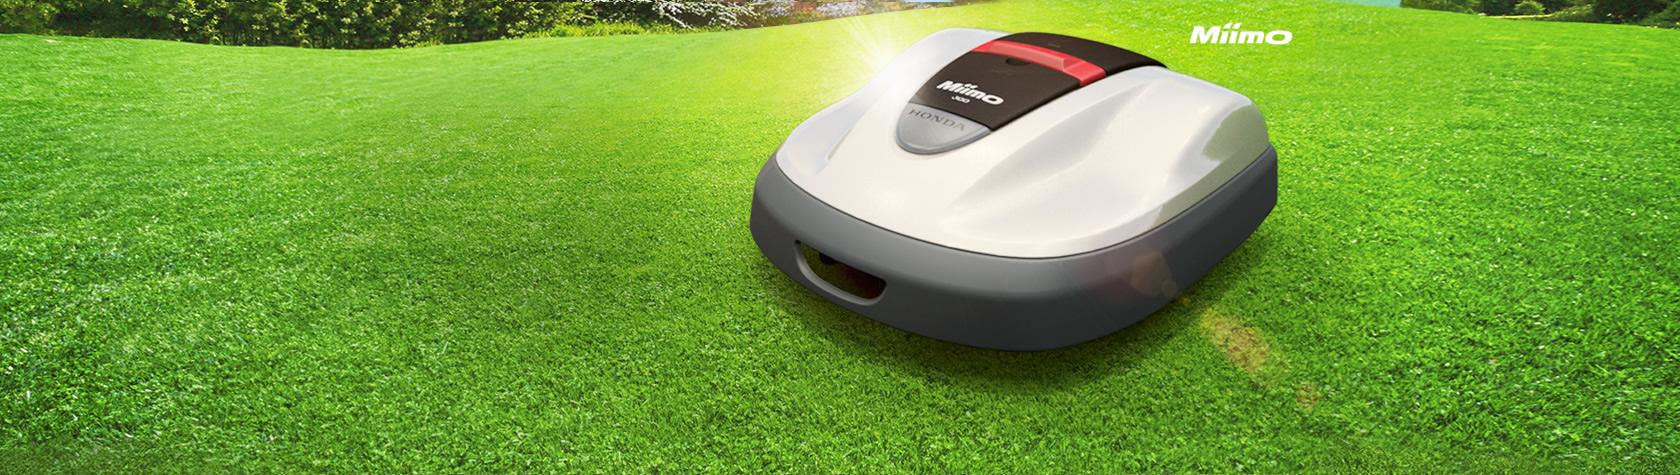 Kampanj på Hondas robotgräsklippare Miimo